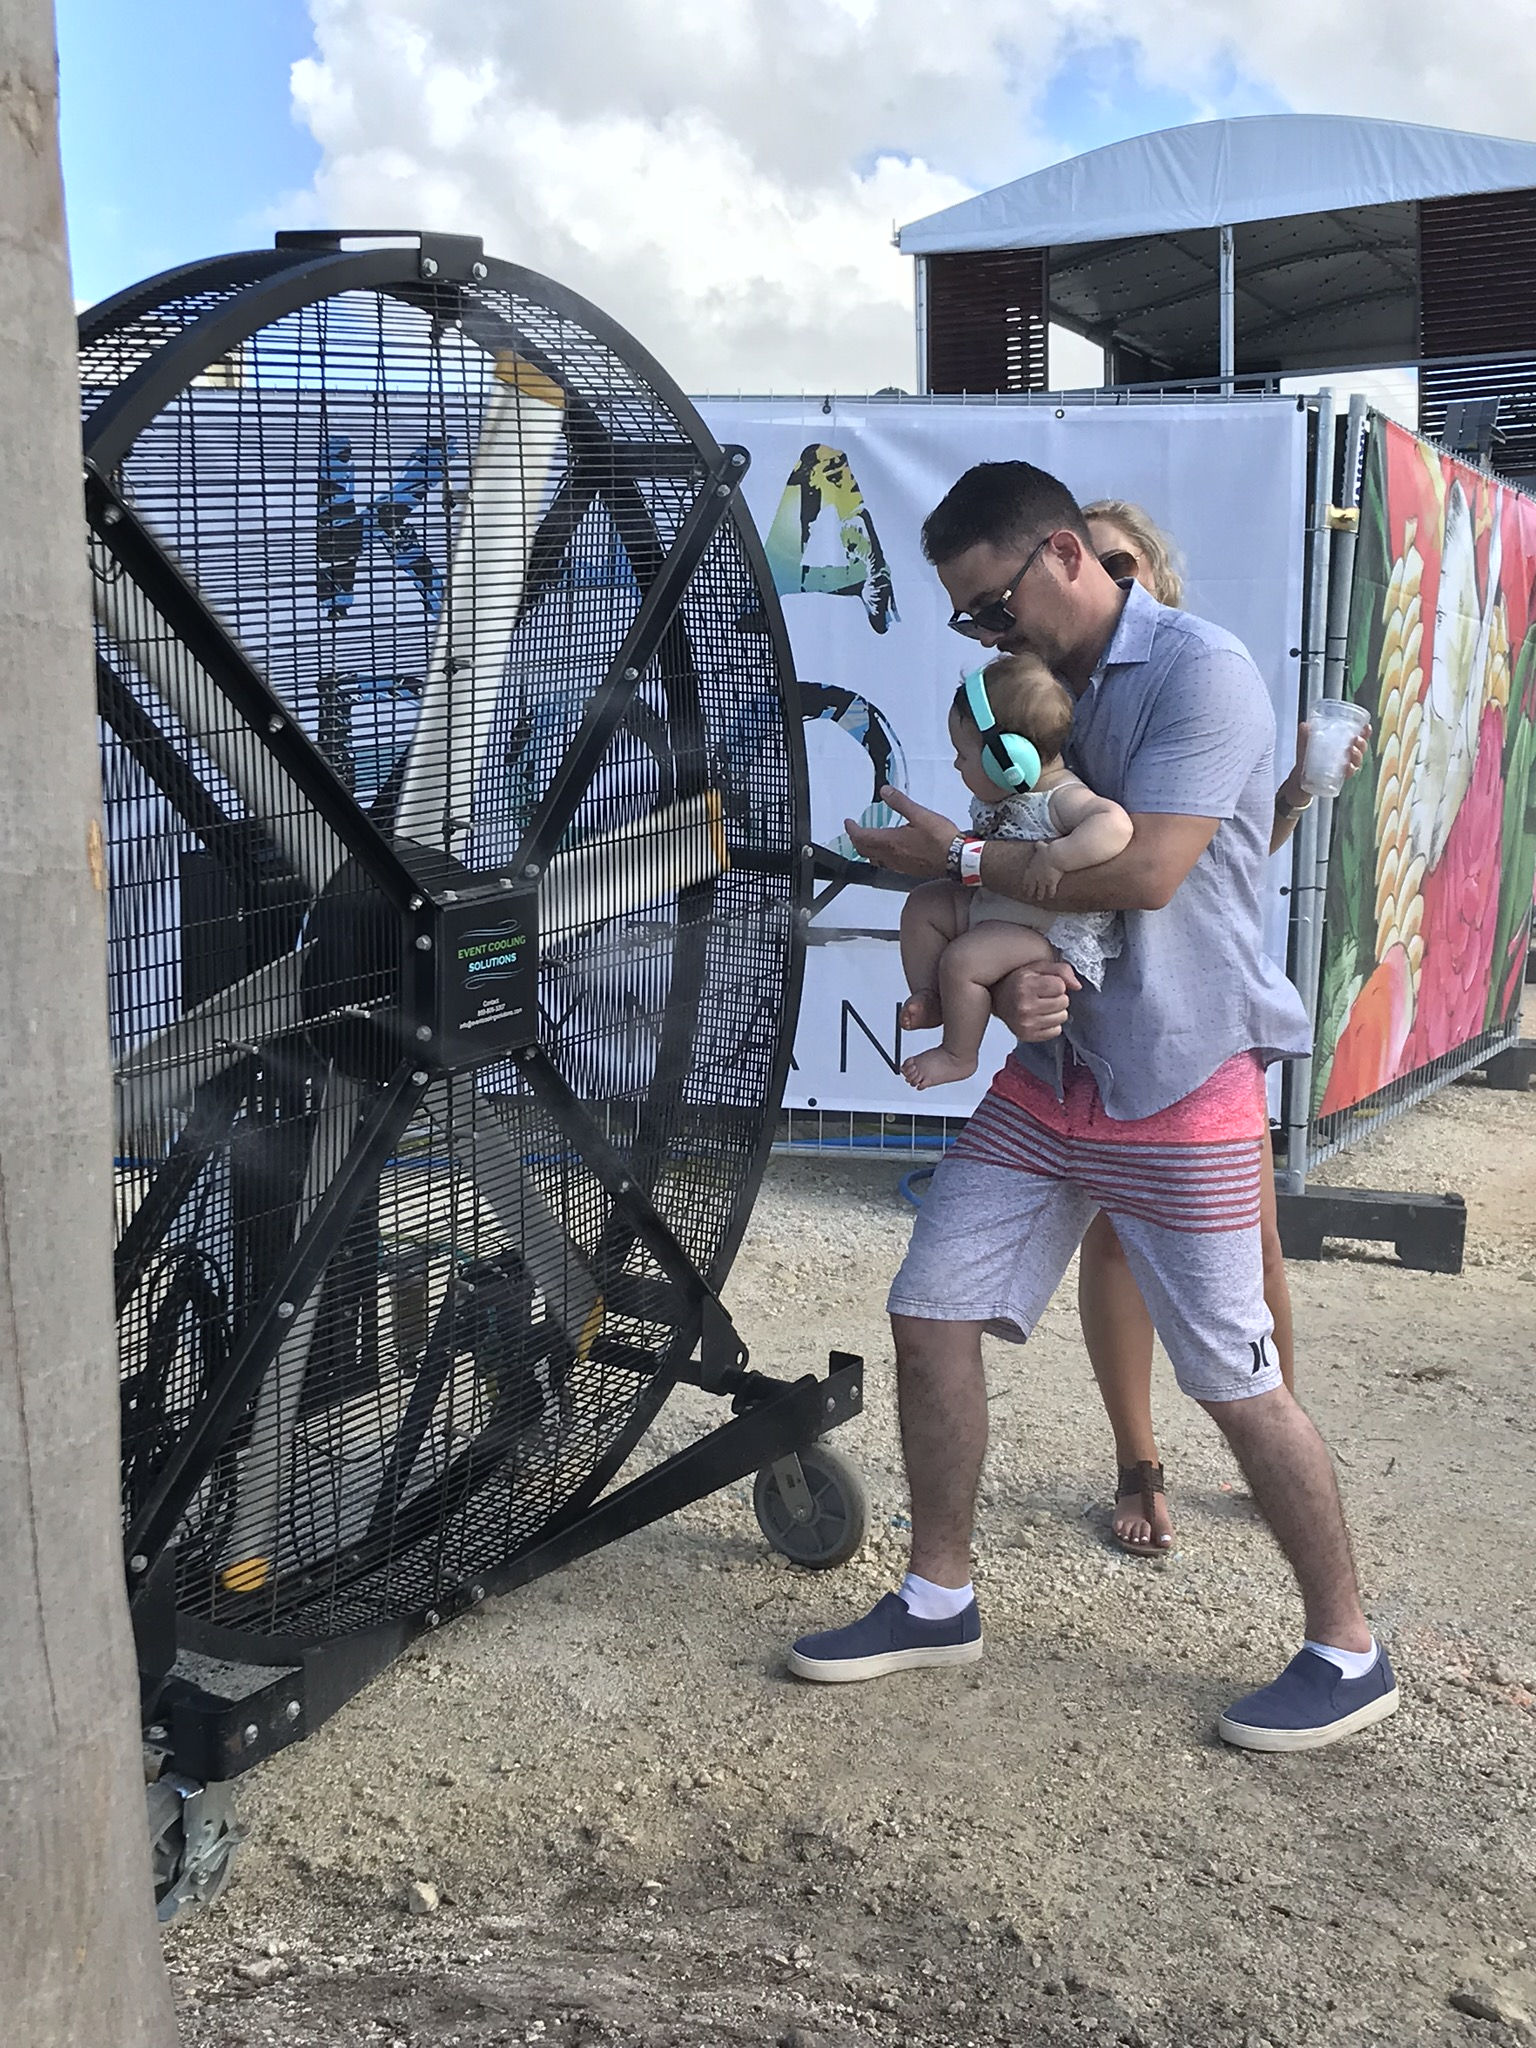 Even Babies Love the Big Black Misting Fan